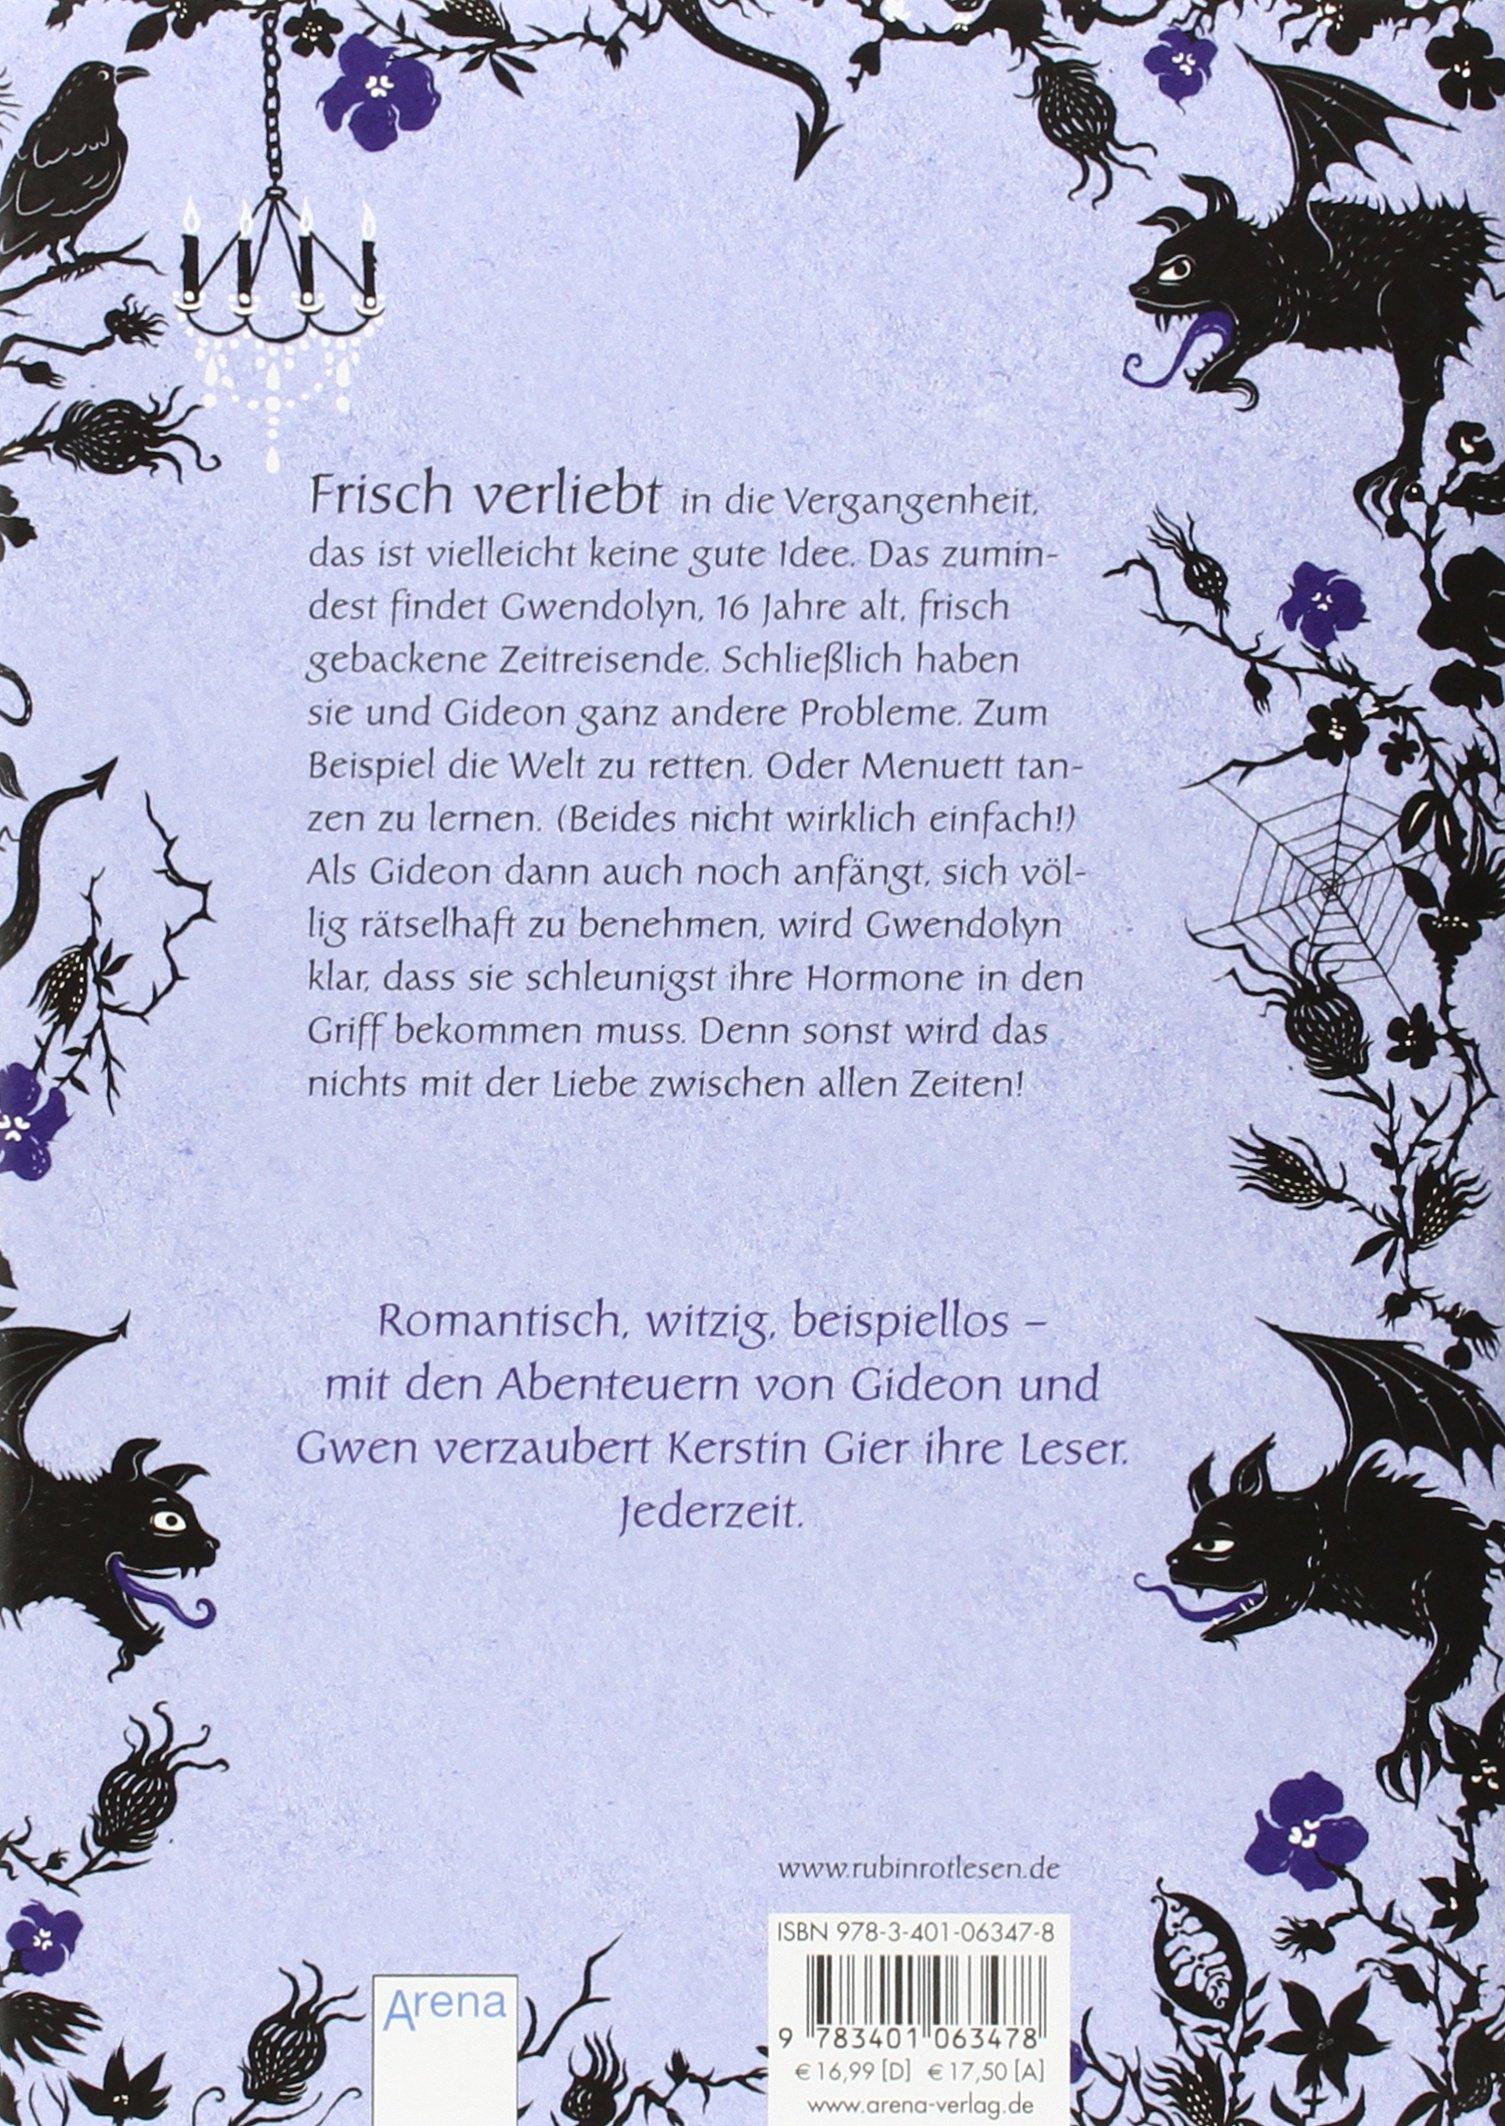 Saphirblau (edelstein Trilogie, #2): Kerstin Gier: 9783401063478:  Amazon: Books